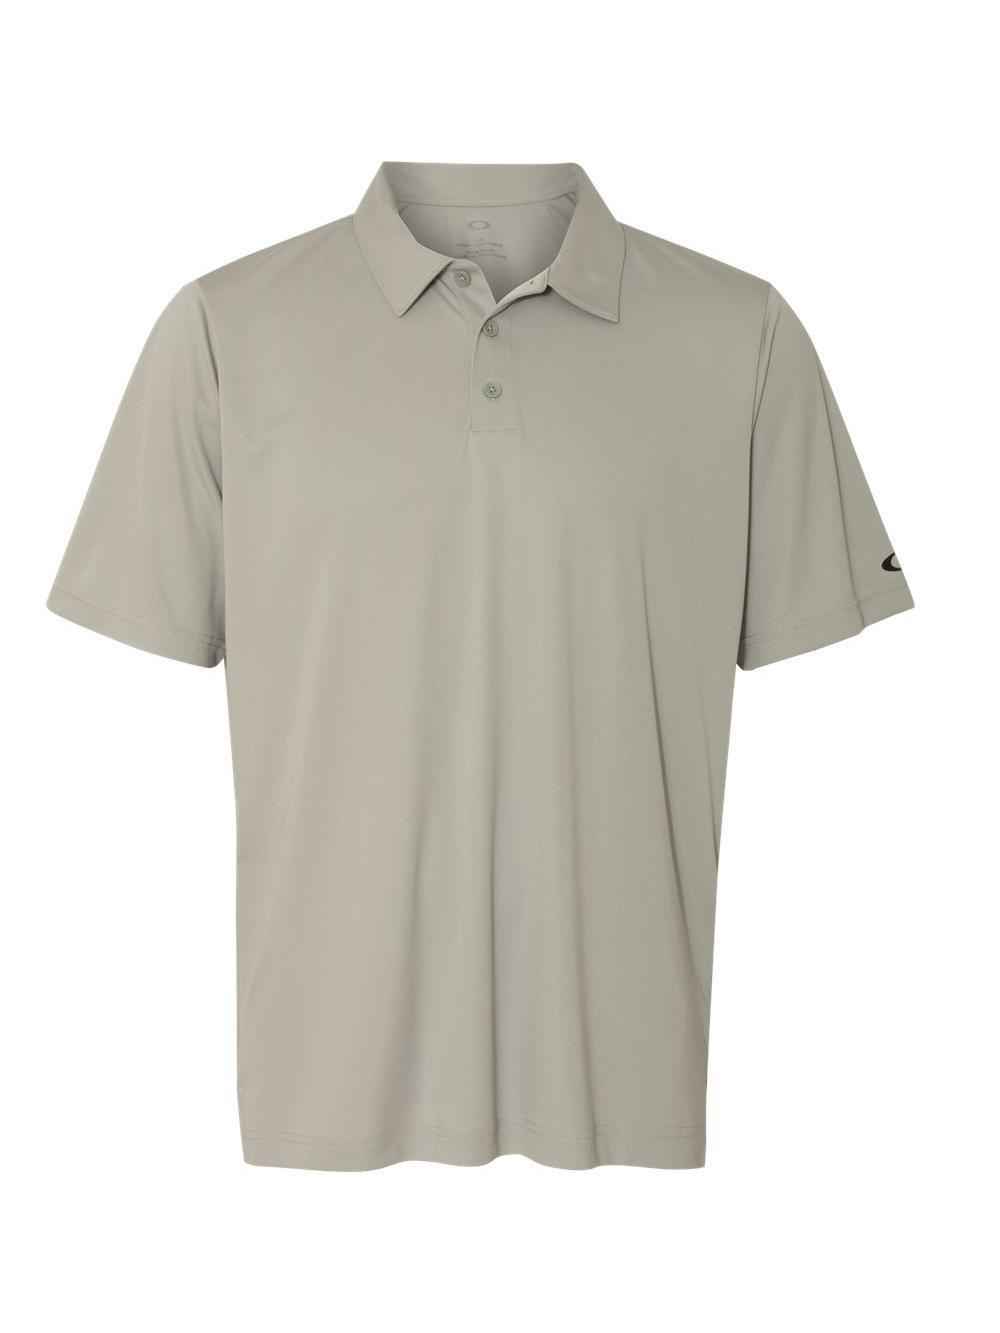 Oakley-Performance-Sport-Shirt-433979ODM thumbnail 15